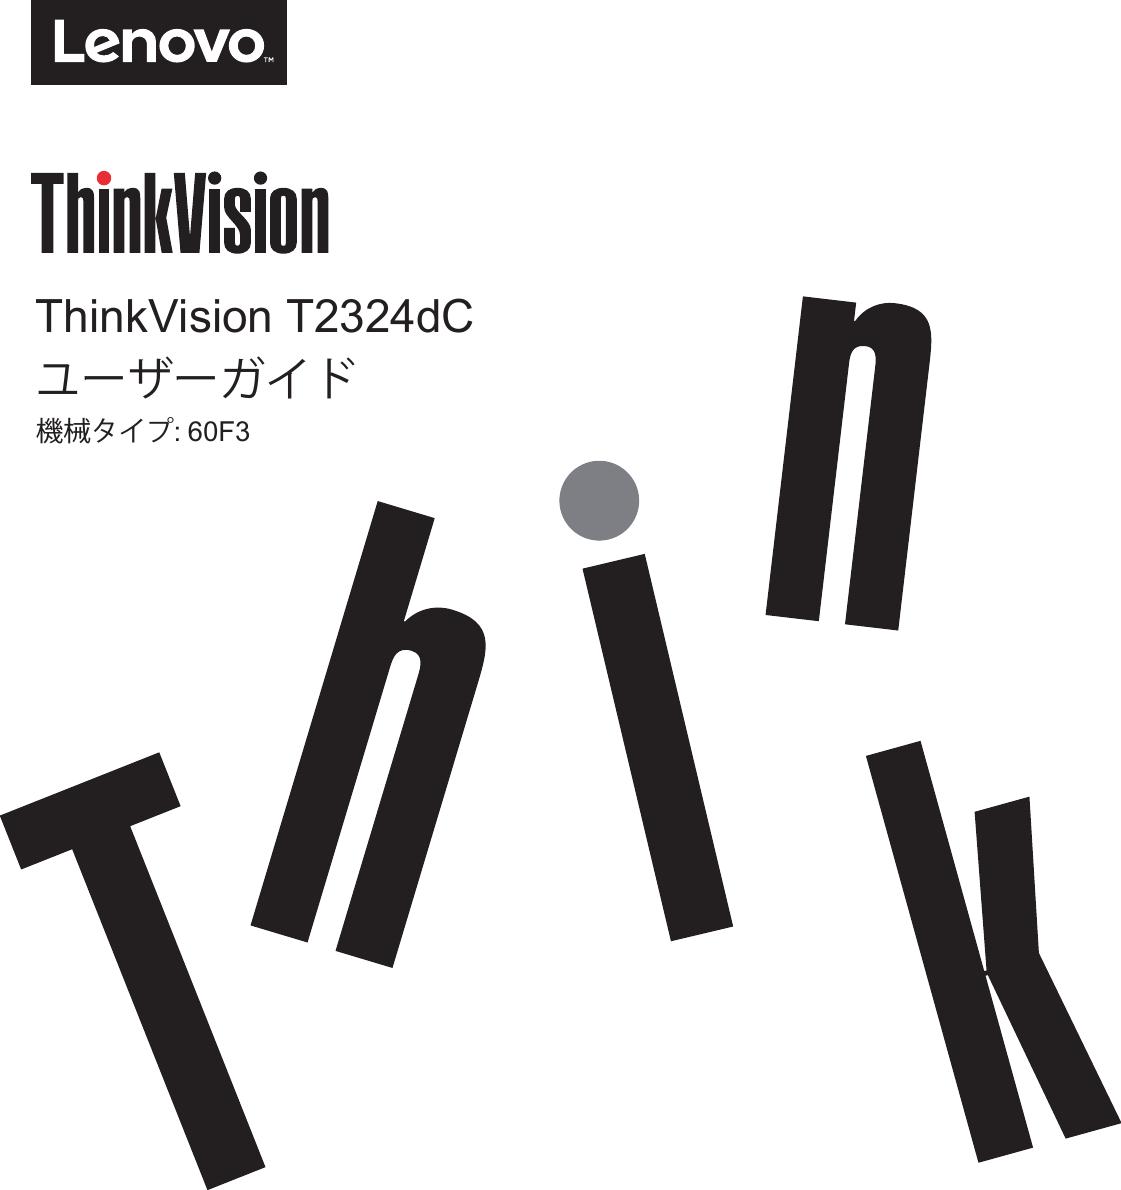 Lenovo T2324D 60F3 Userjpn User Manual ユーザーガイド Think